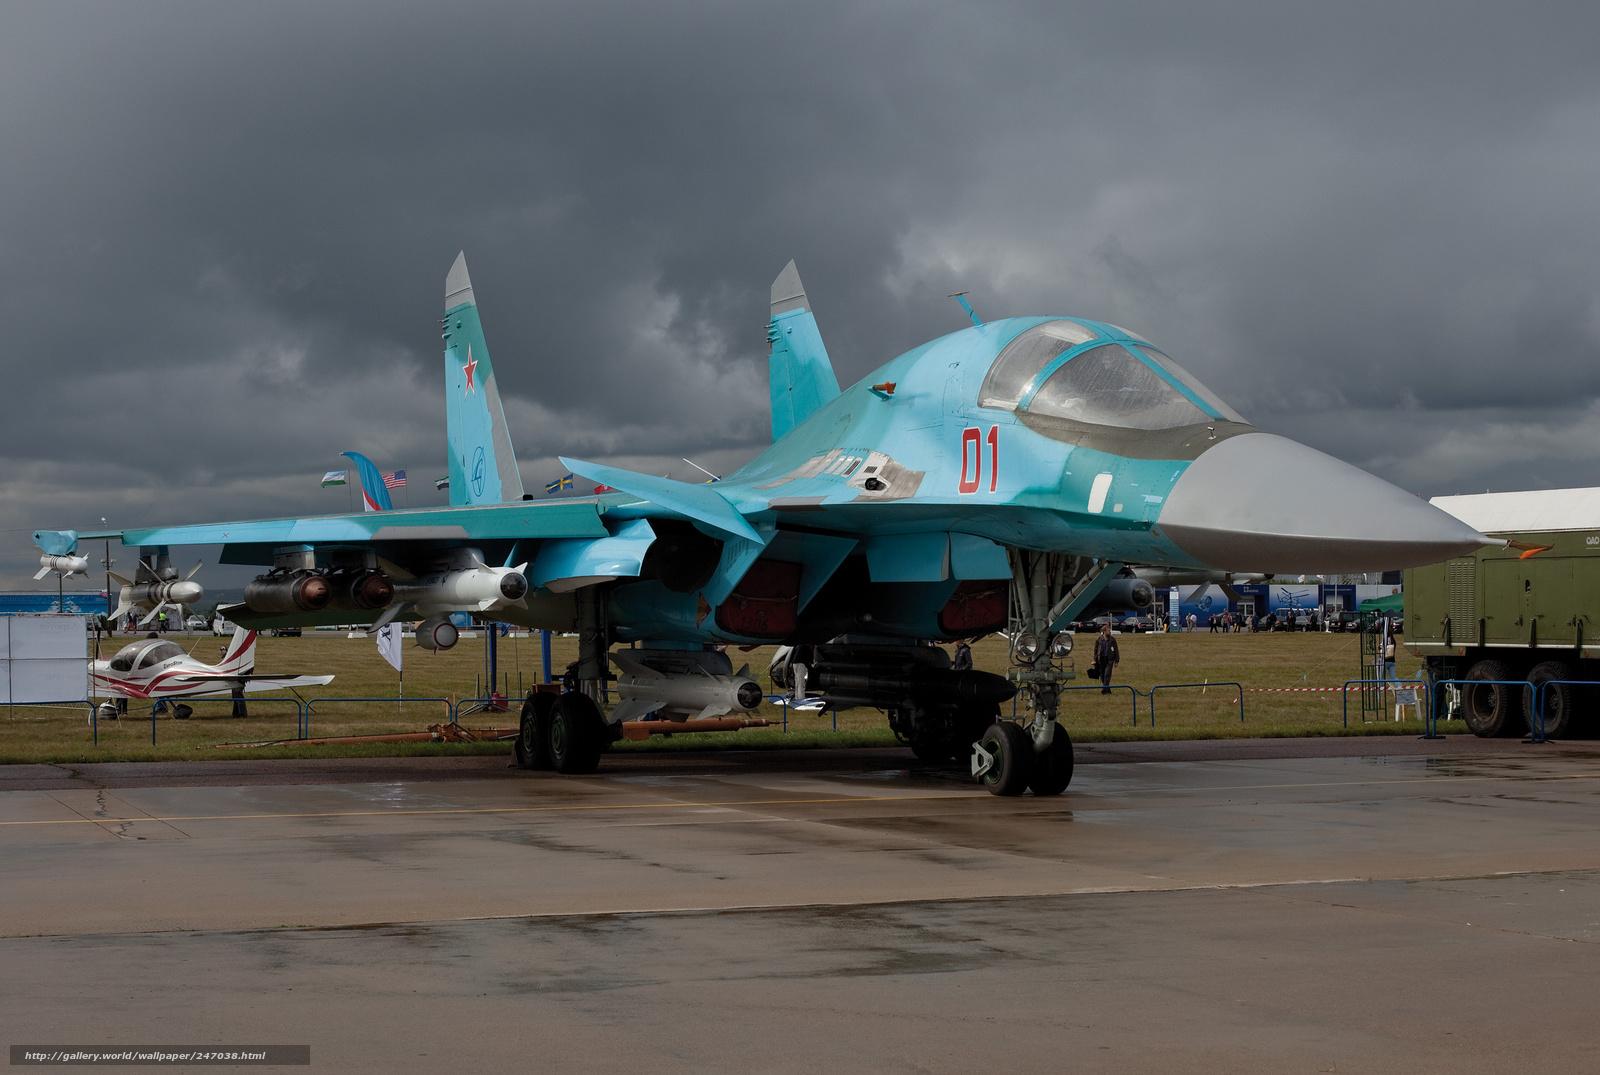 Su 34 (航空機)の画像 p1_31